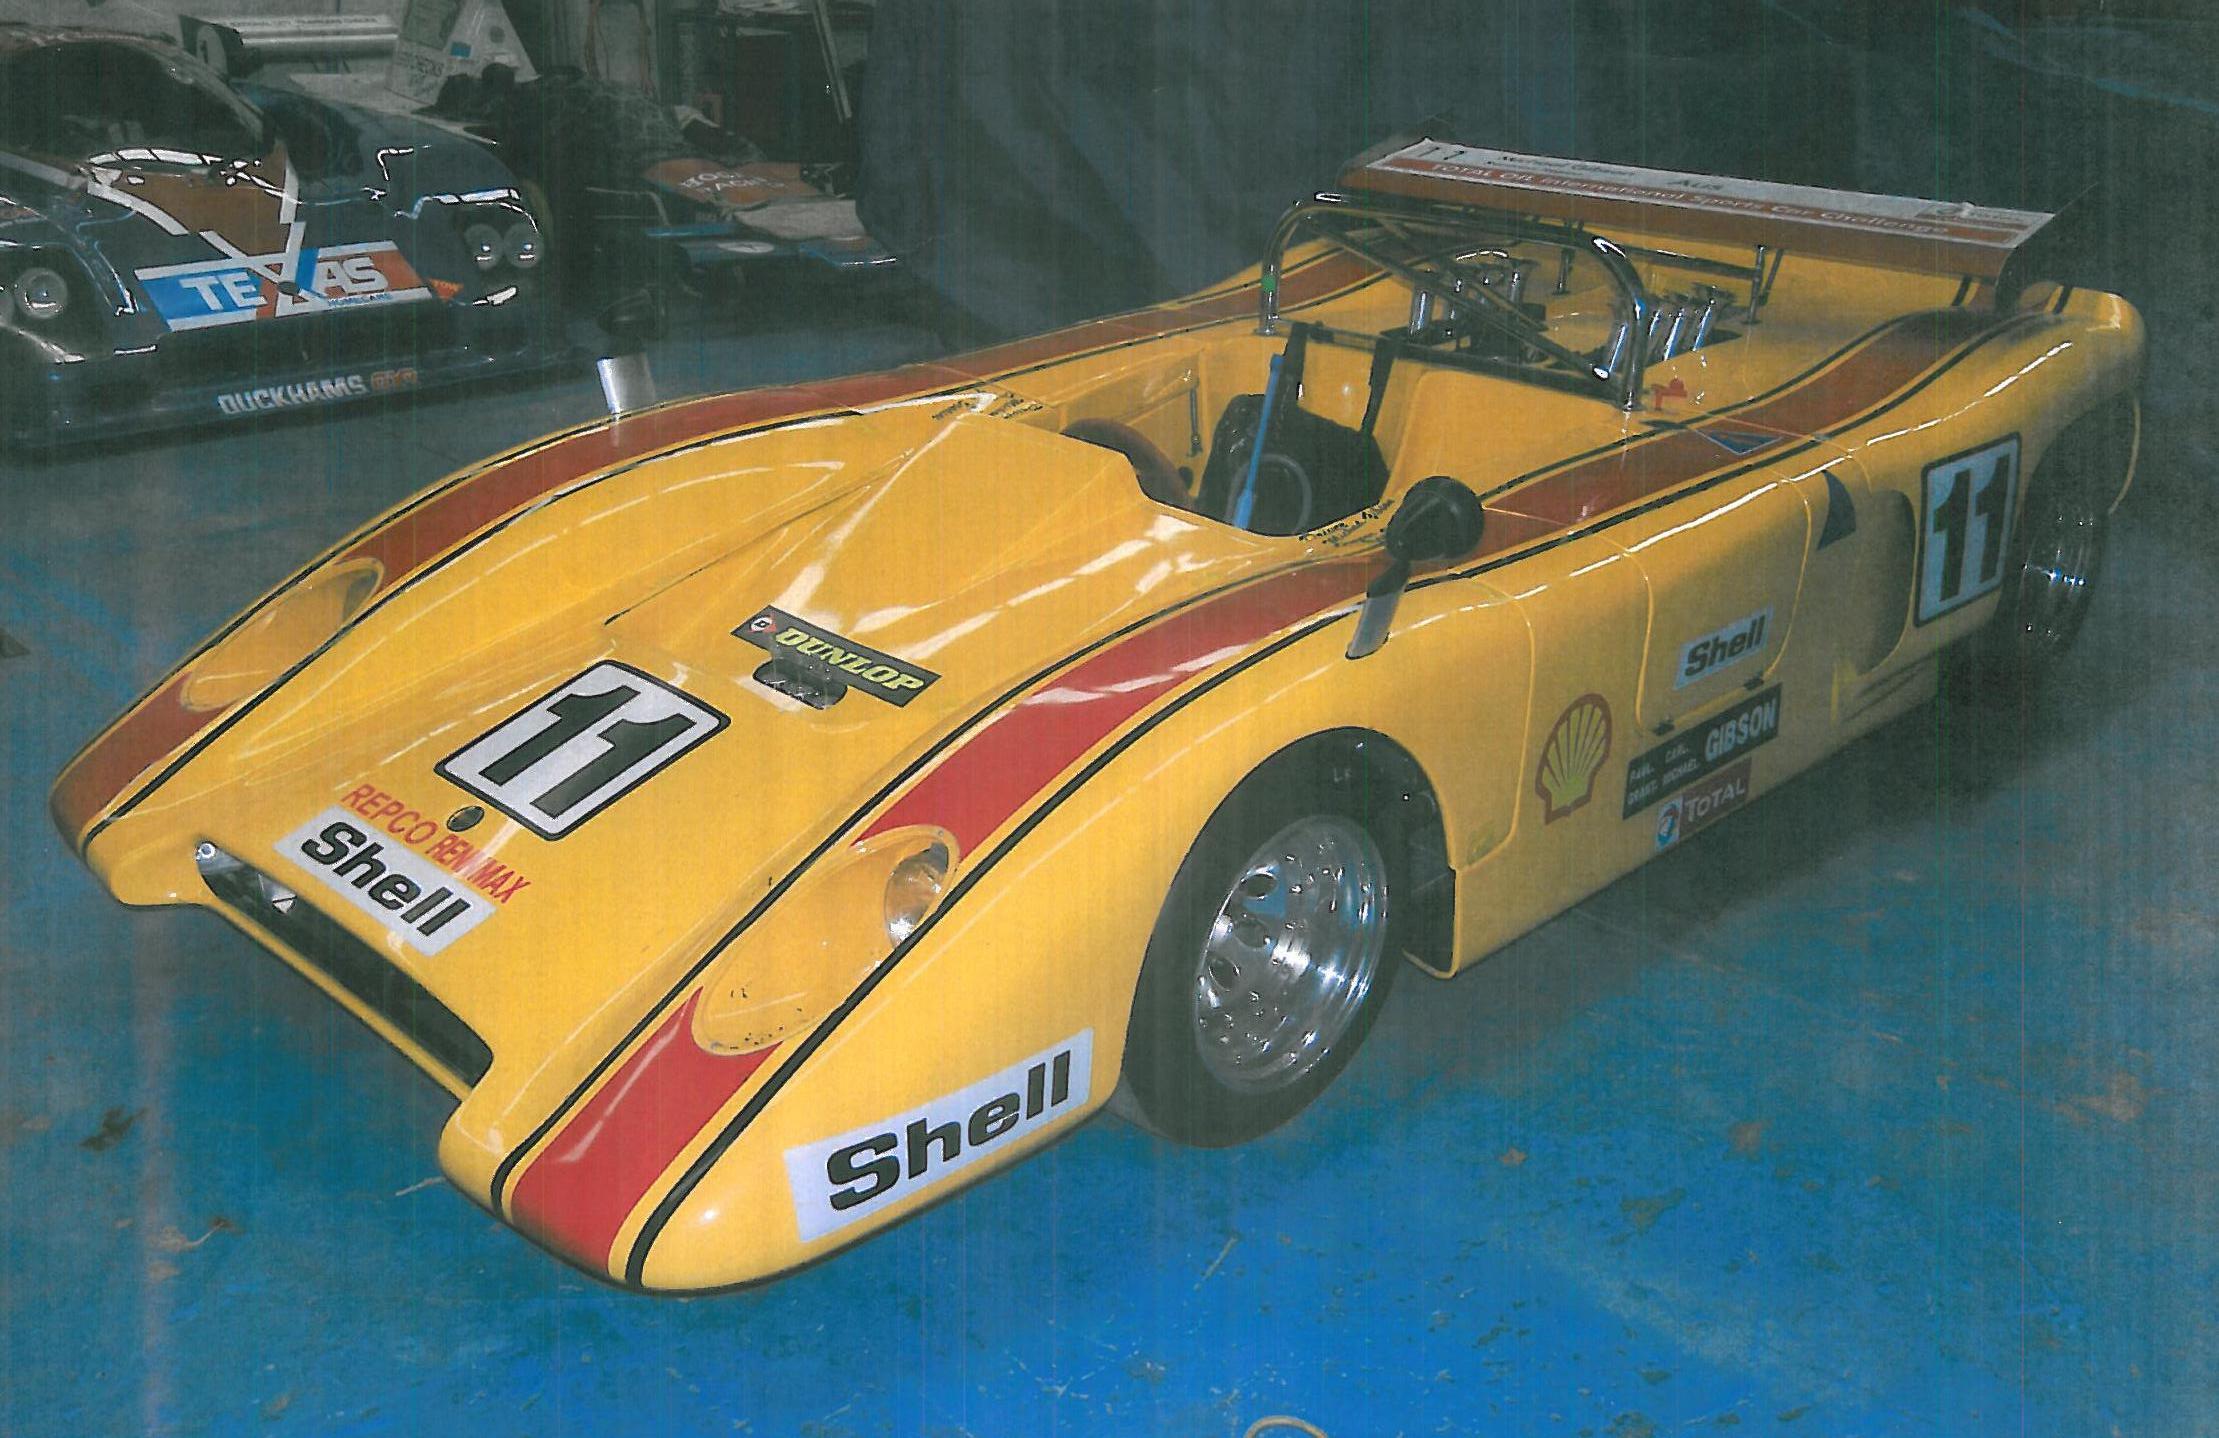 Race_car_stolen_-_Rowville_1_-_cropped.JPG